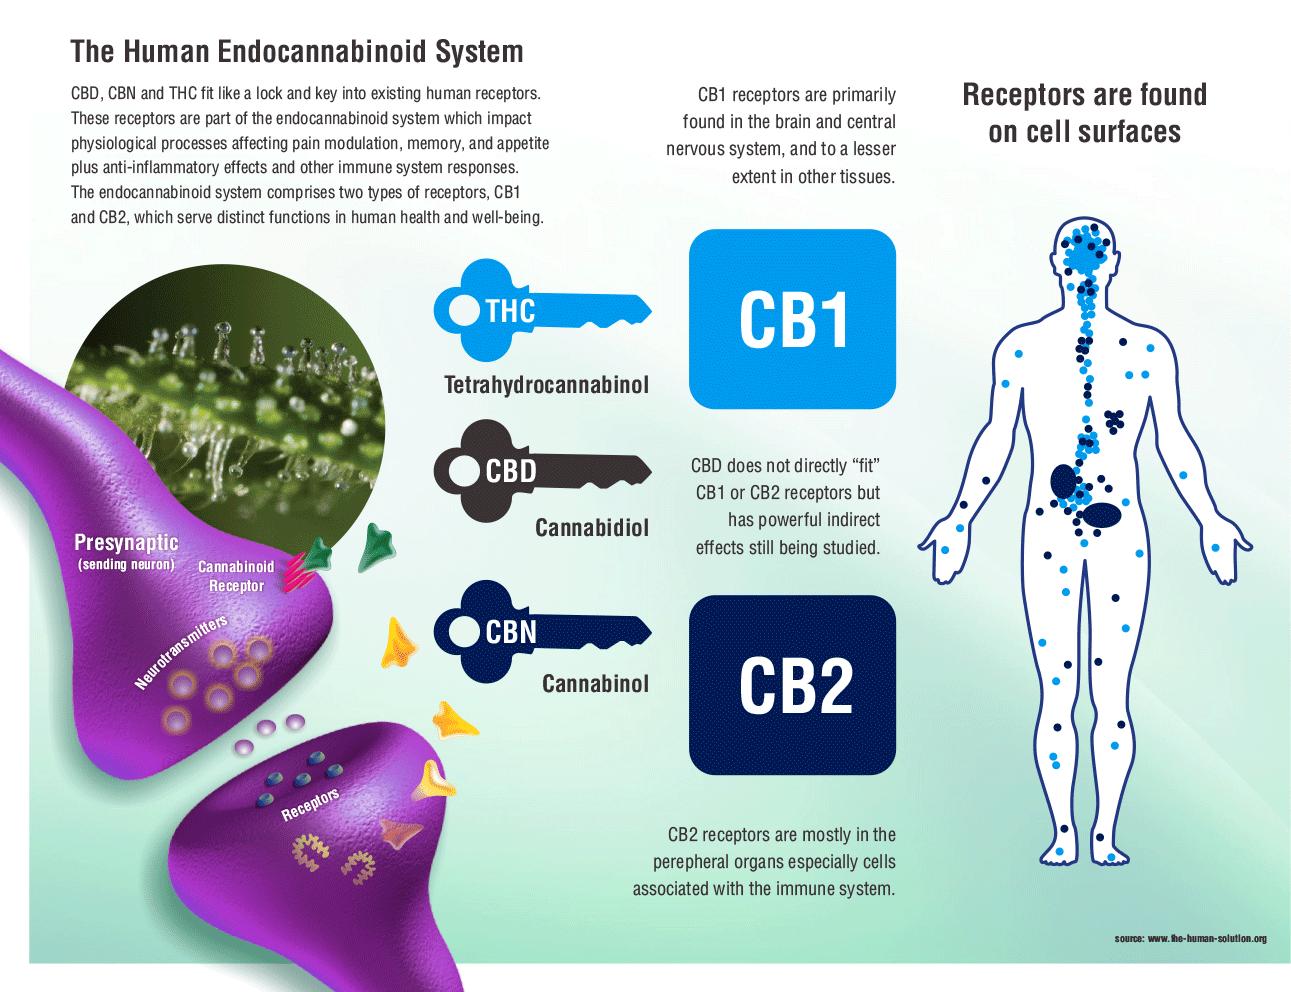 Endocannabinoid System Receptor Sites